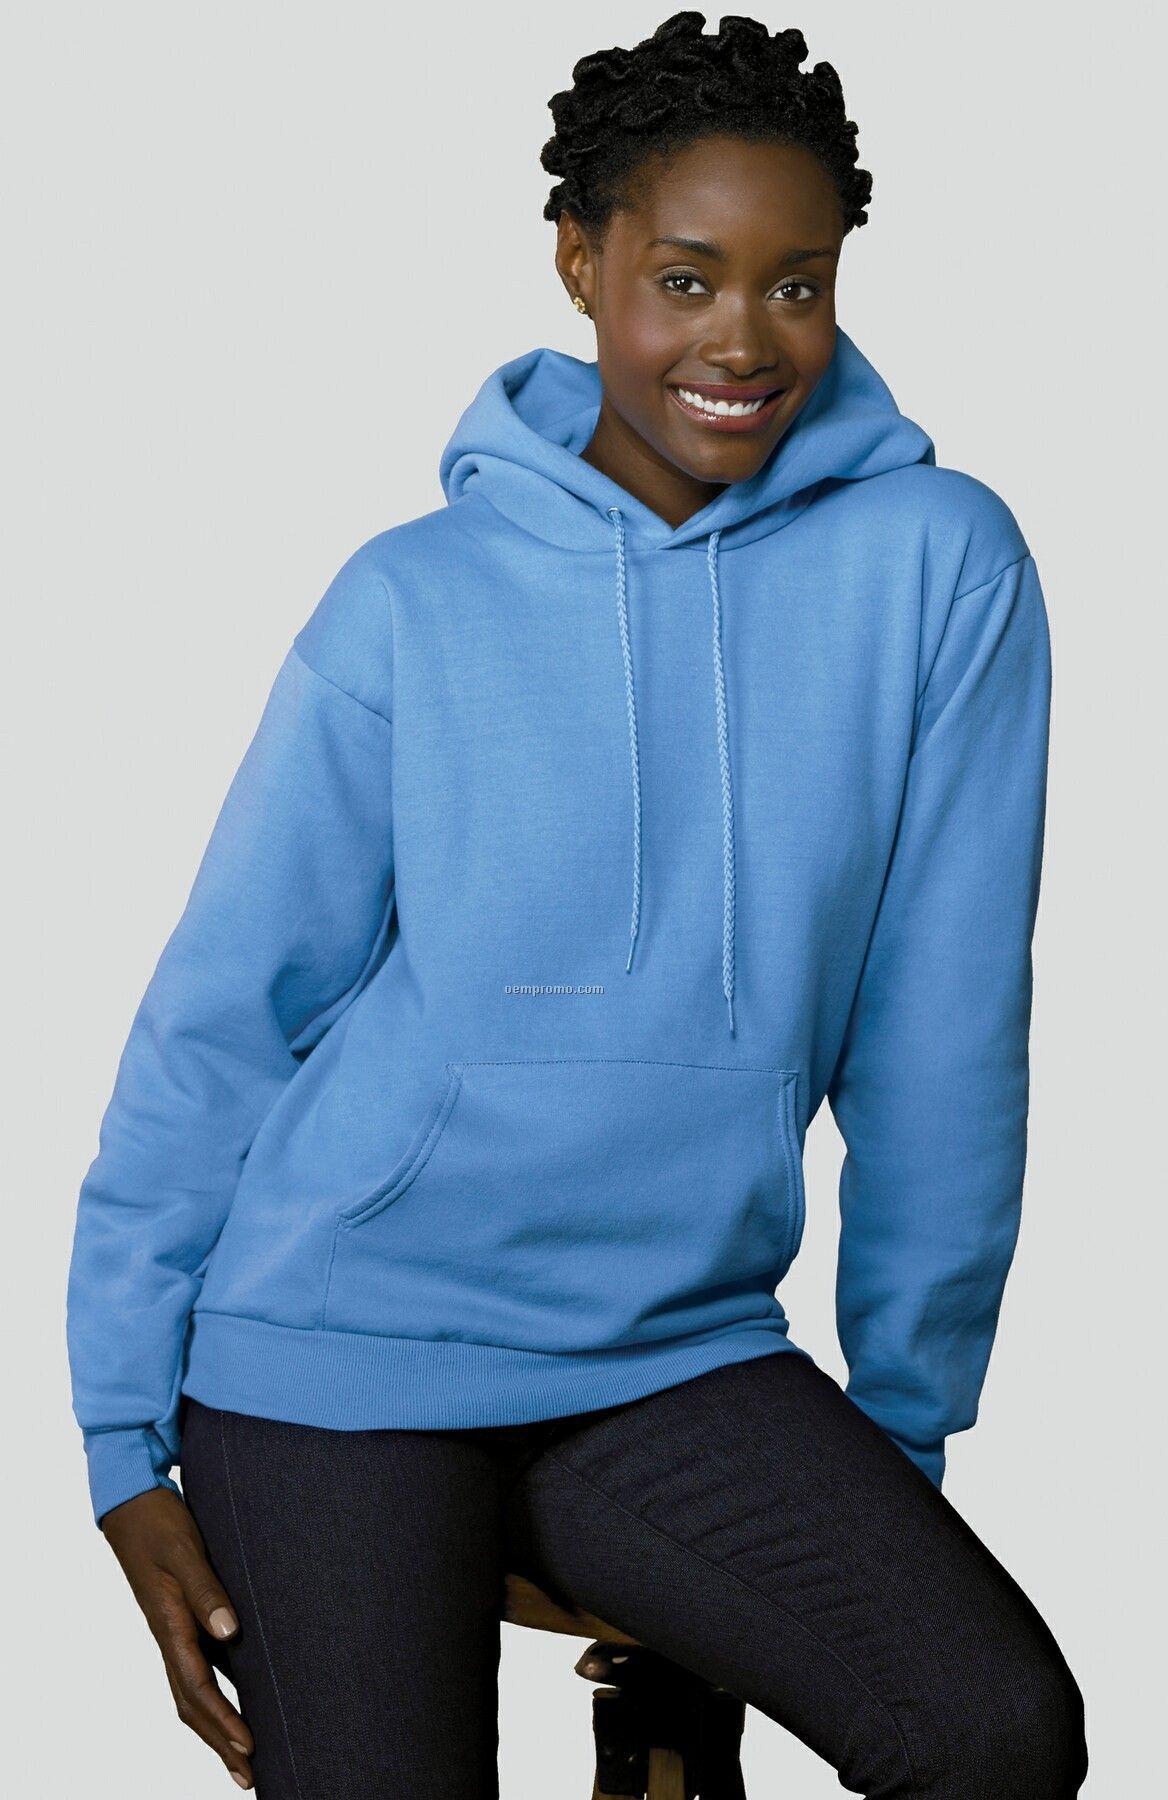 Hanes Comfortblend Pullover Hooded Sweatshirt - Colors